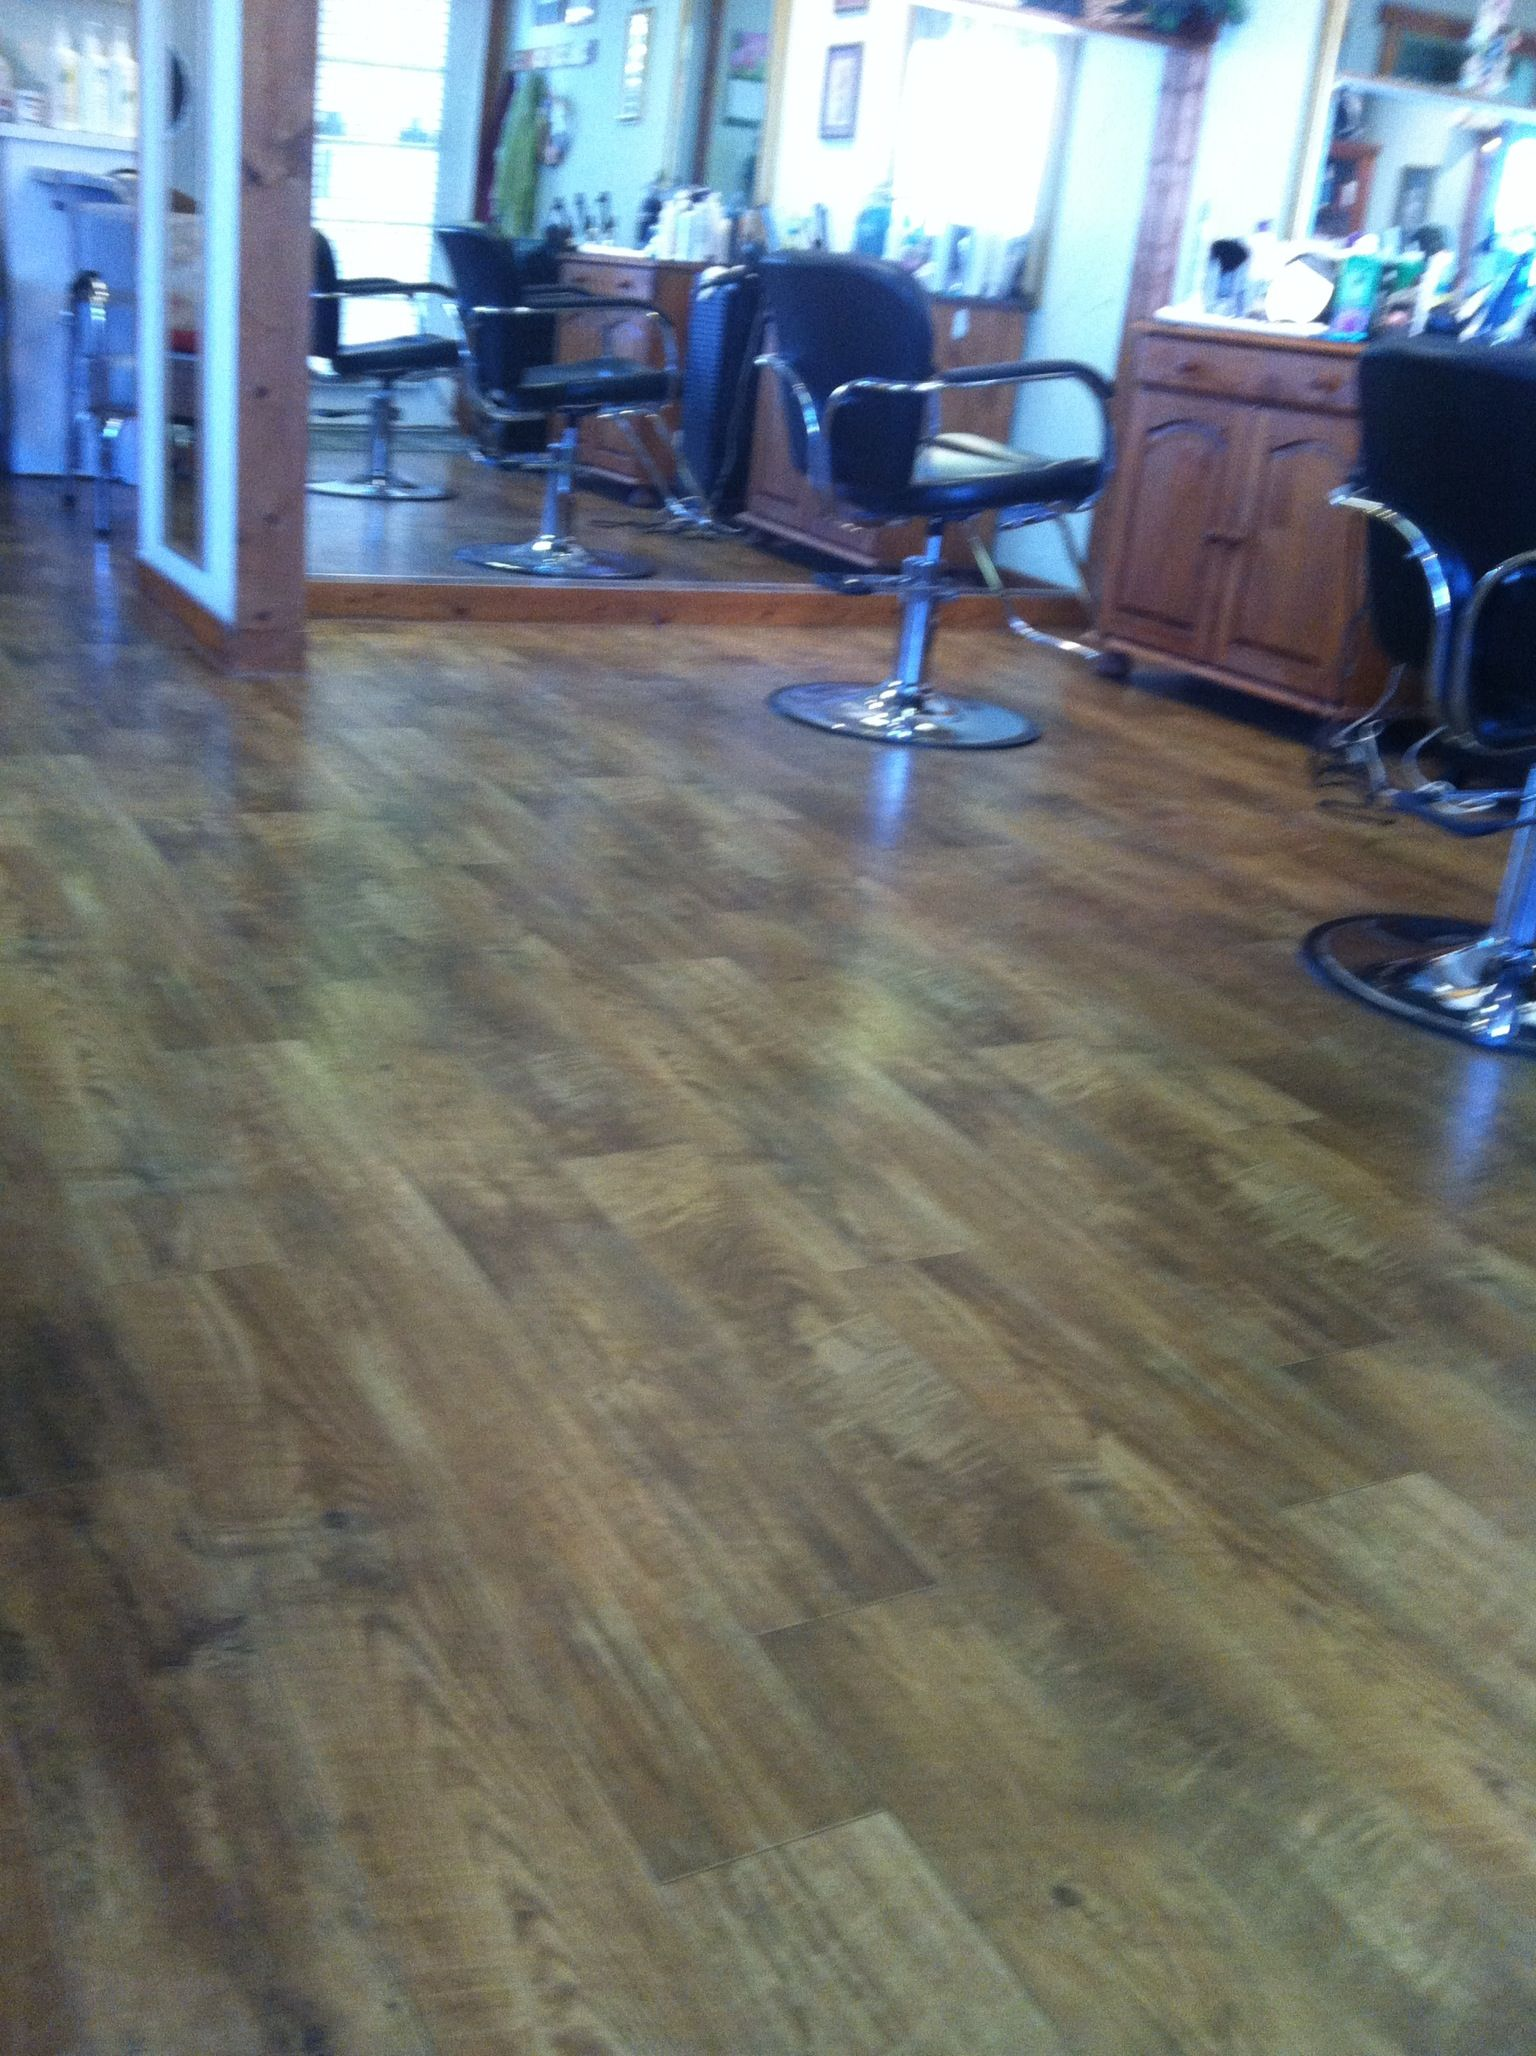 Amazing linoleum at my hair salon Looks and feels like wood